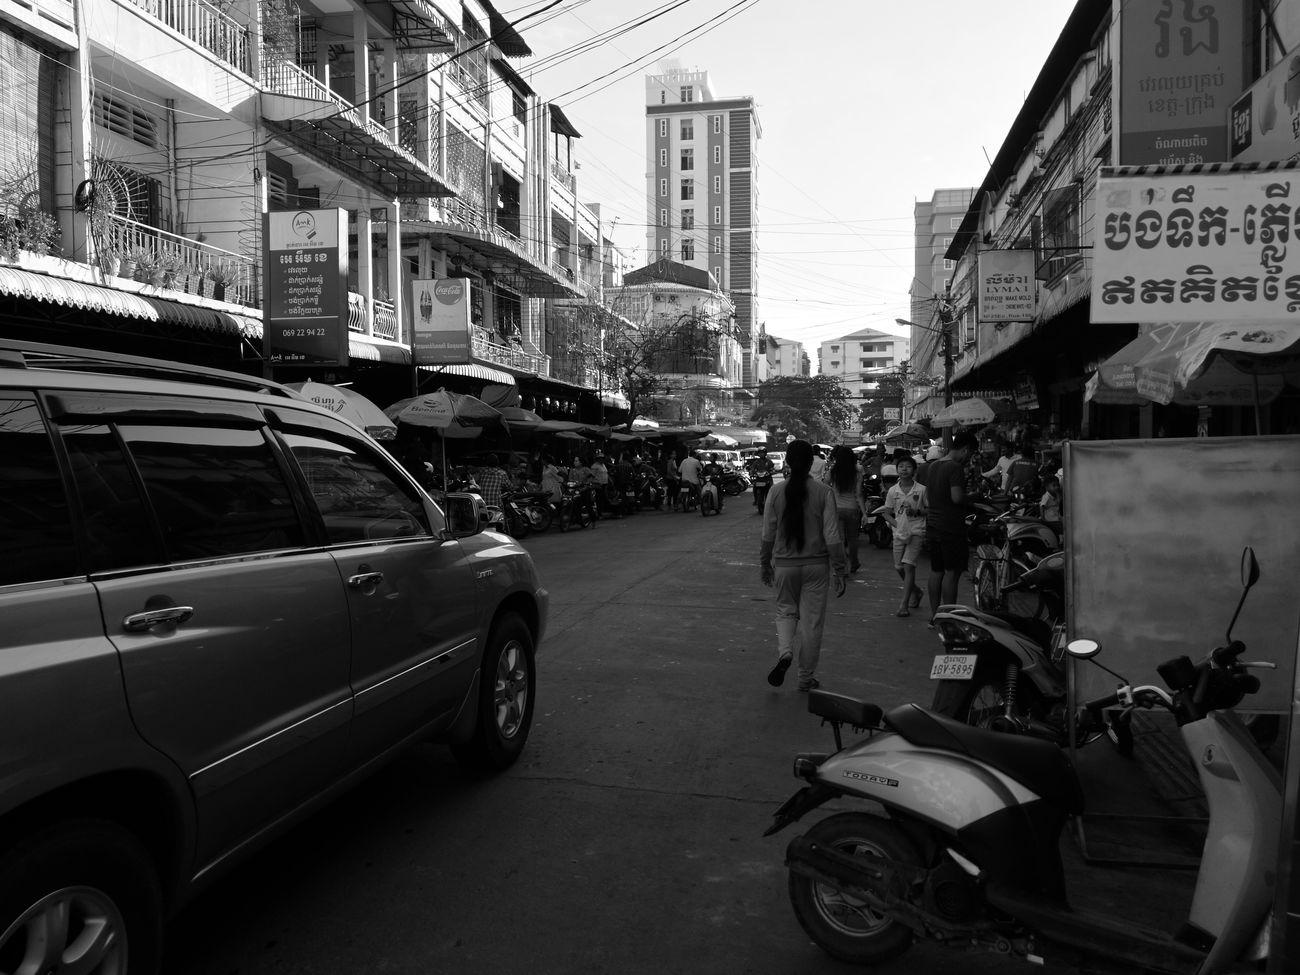 A Sunday morning in Phnom Penh Street People City Phnompenh Cambodia HuaweiP9 OrdinaryLife Sundaymorning